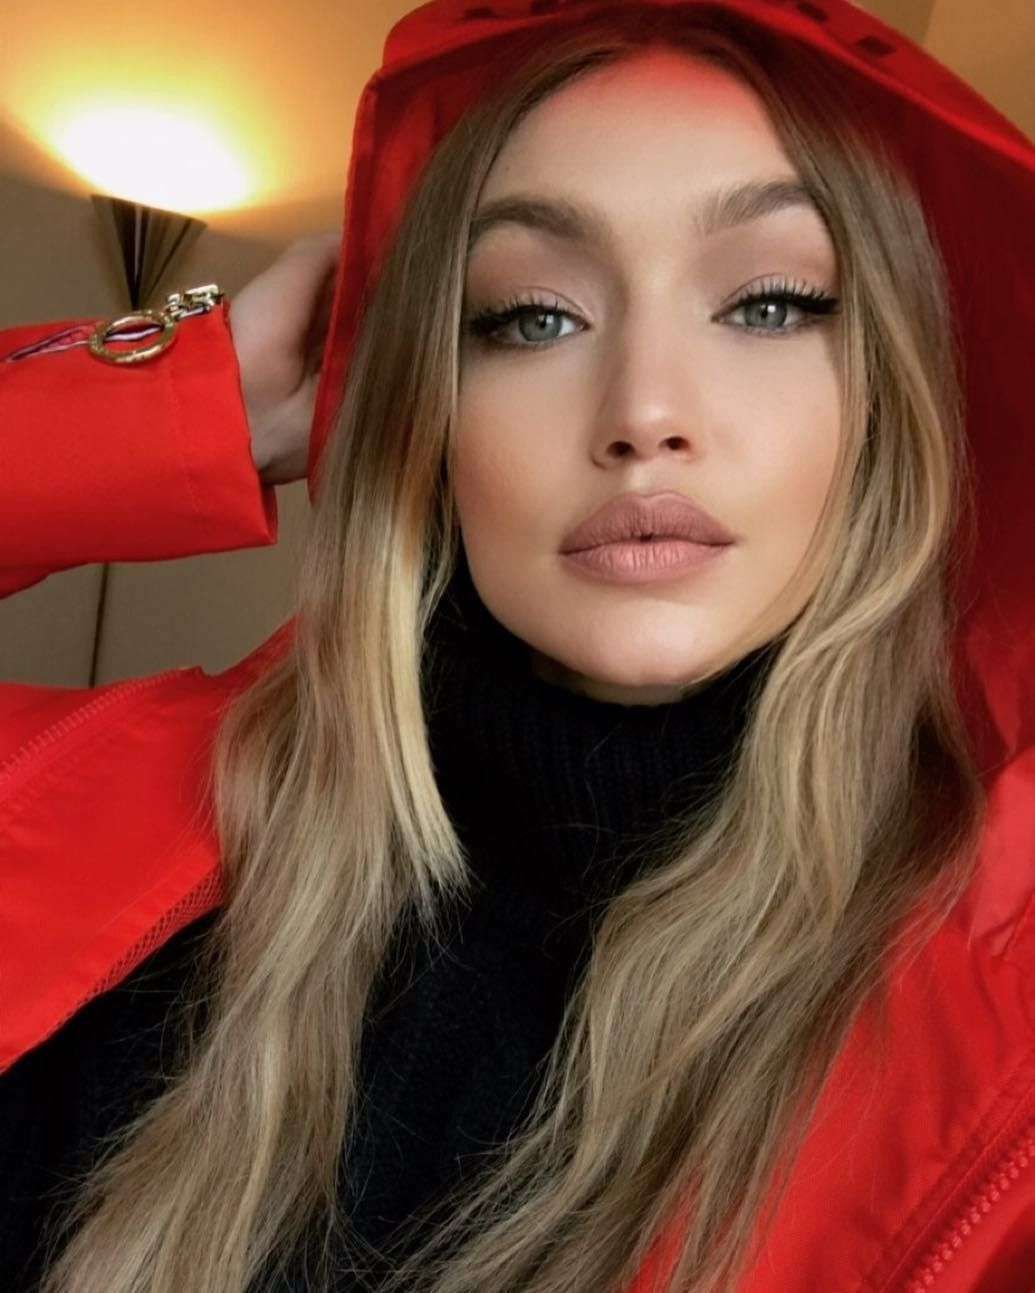 Selfie Marissa Nicole nude photos 2019